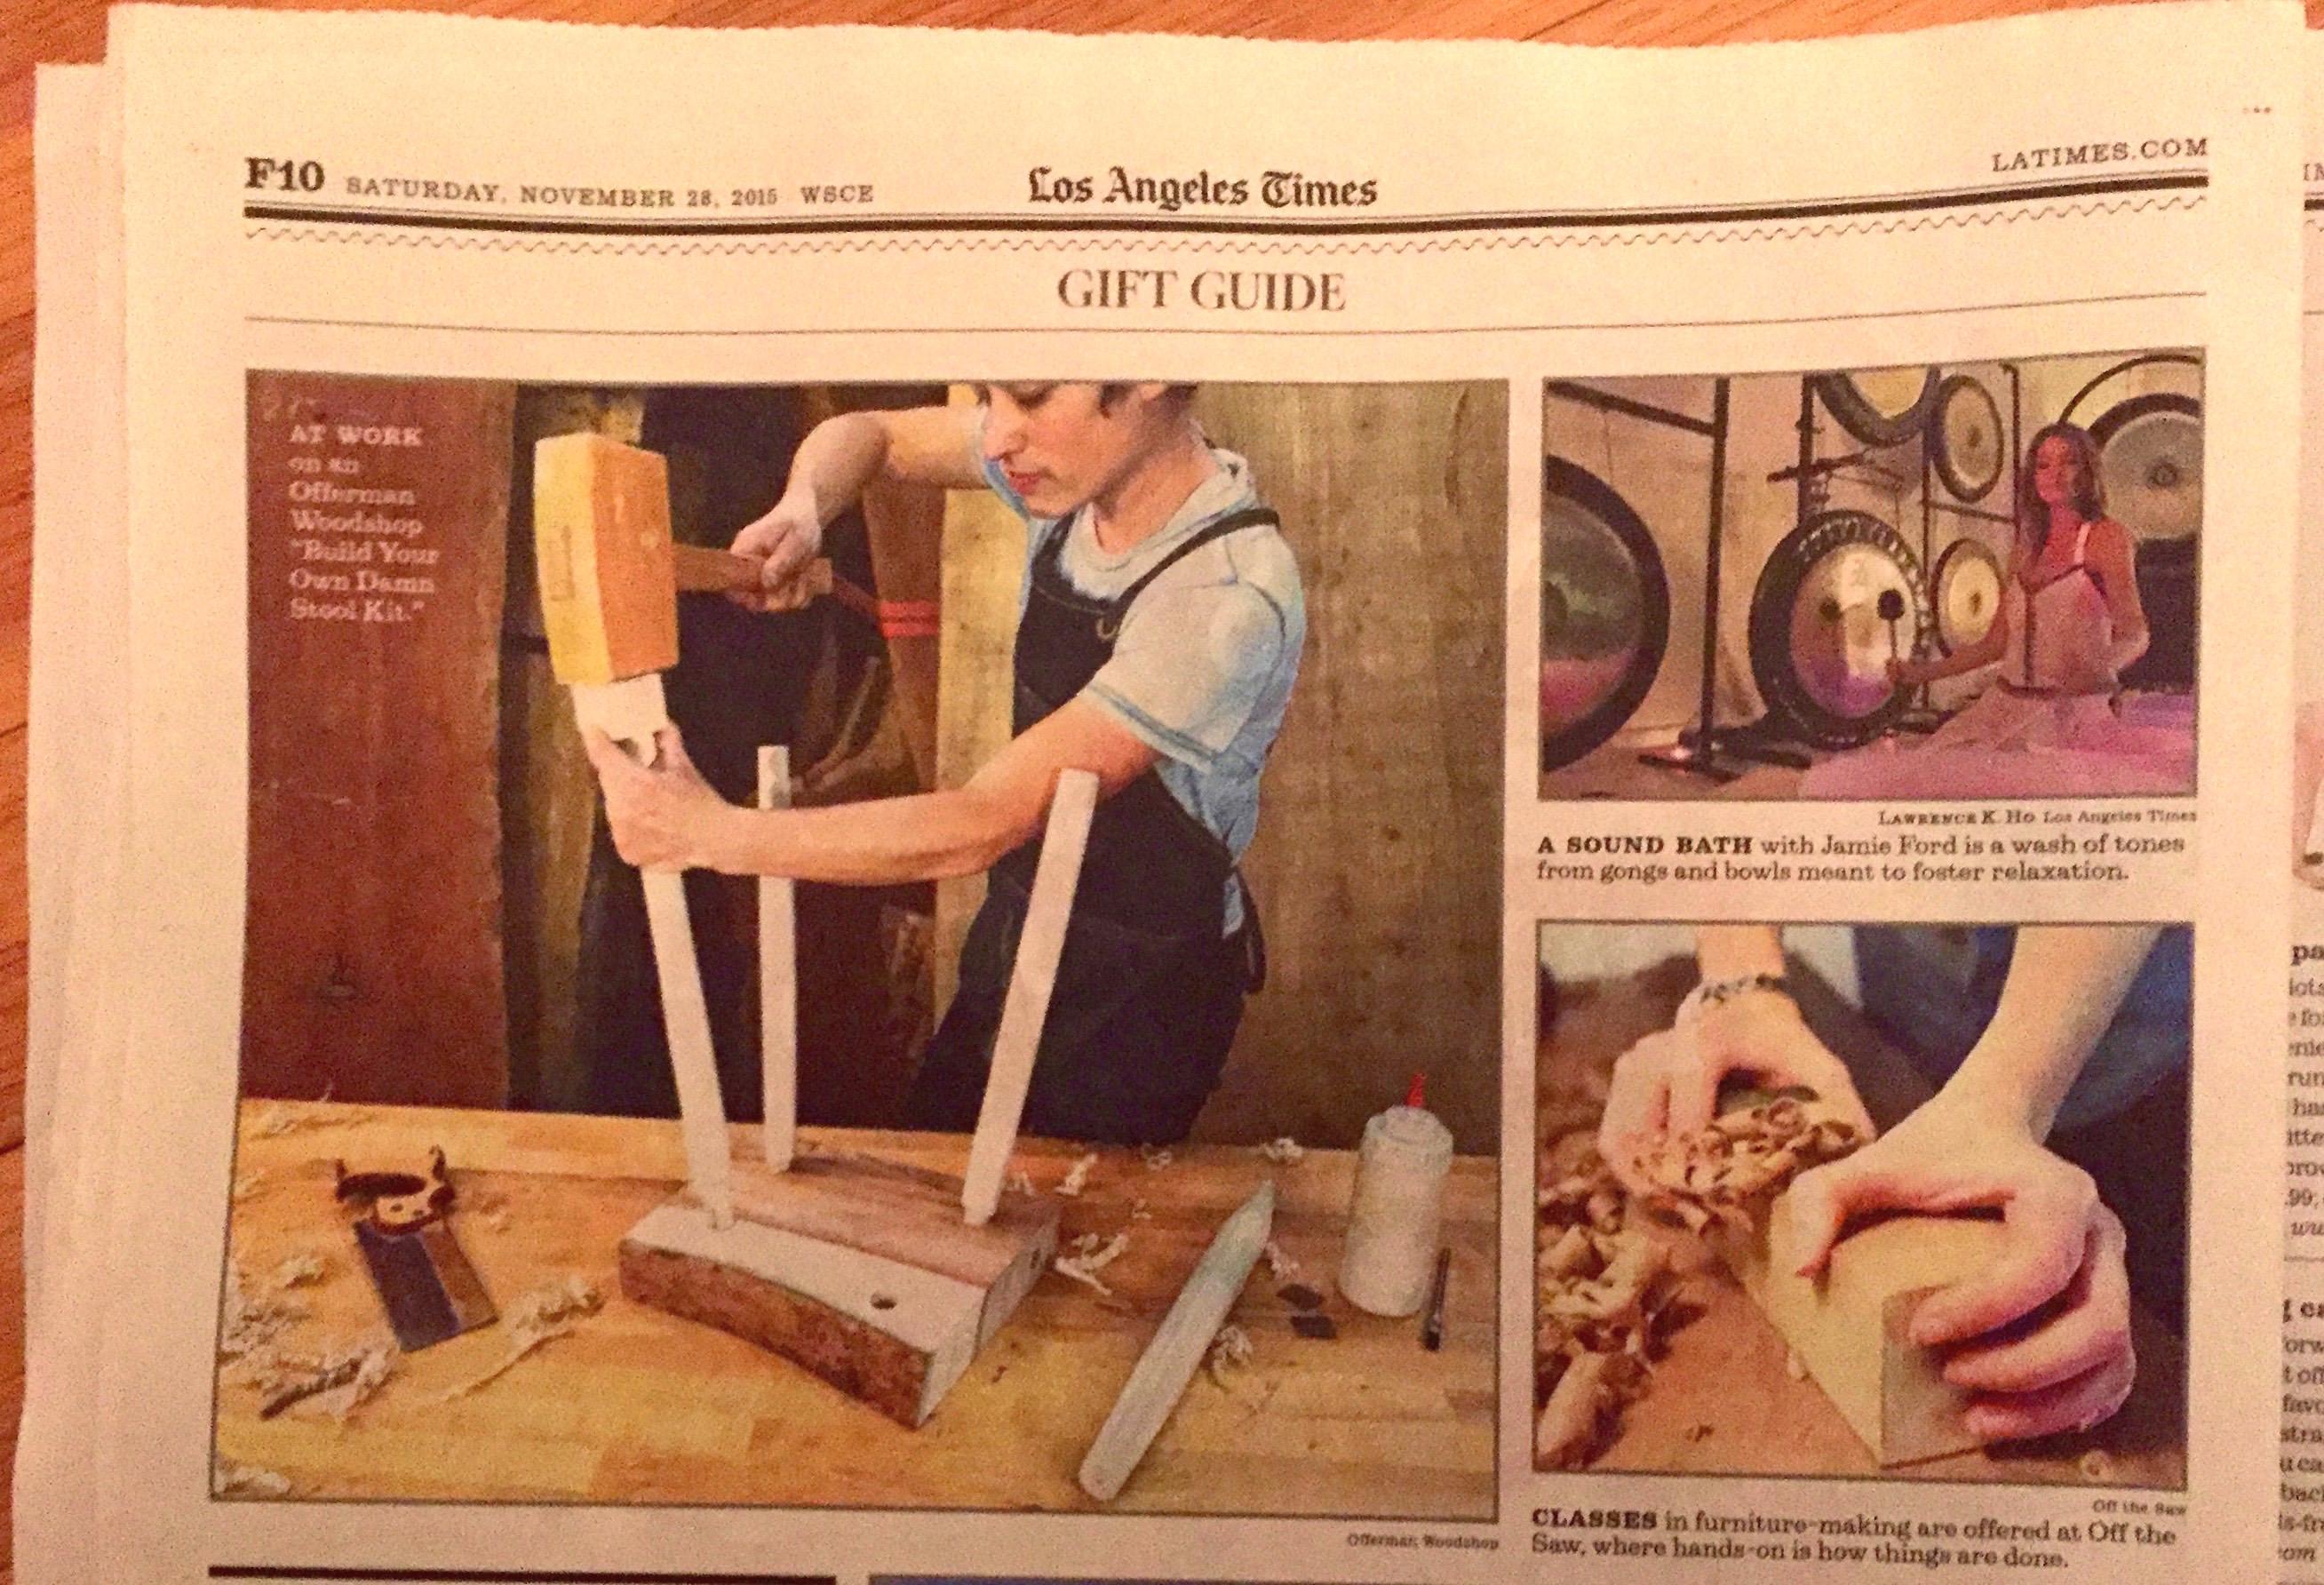 latimes - 1 (1)